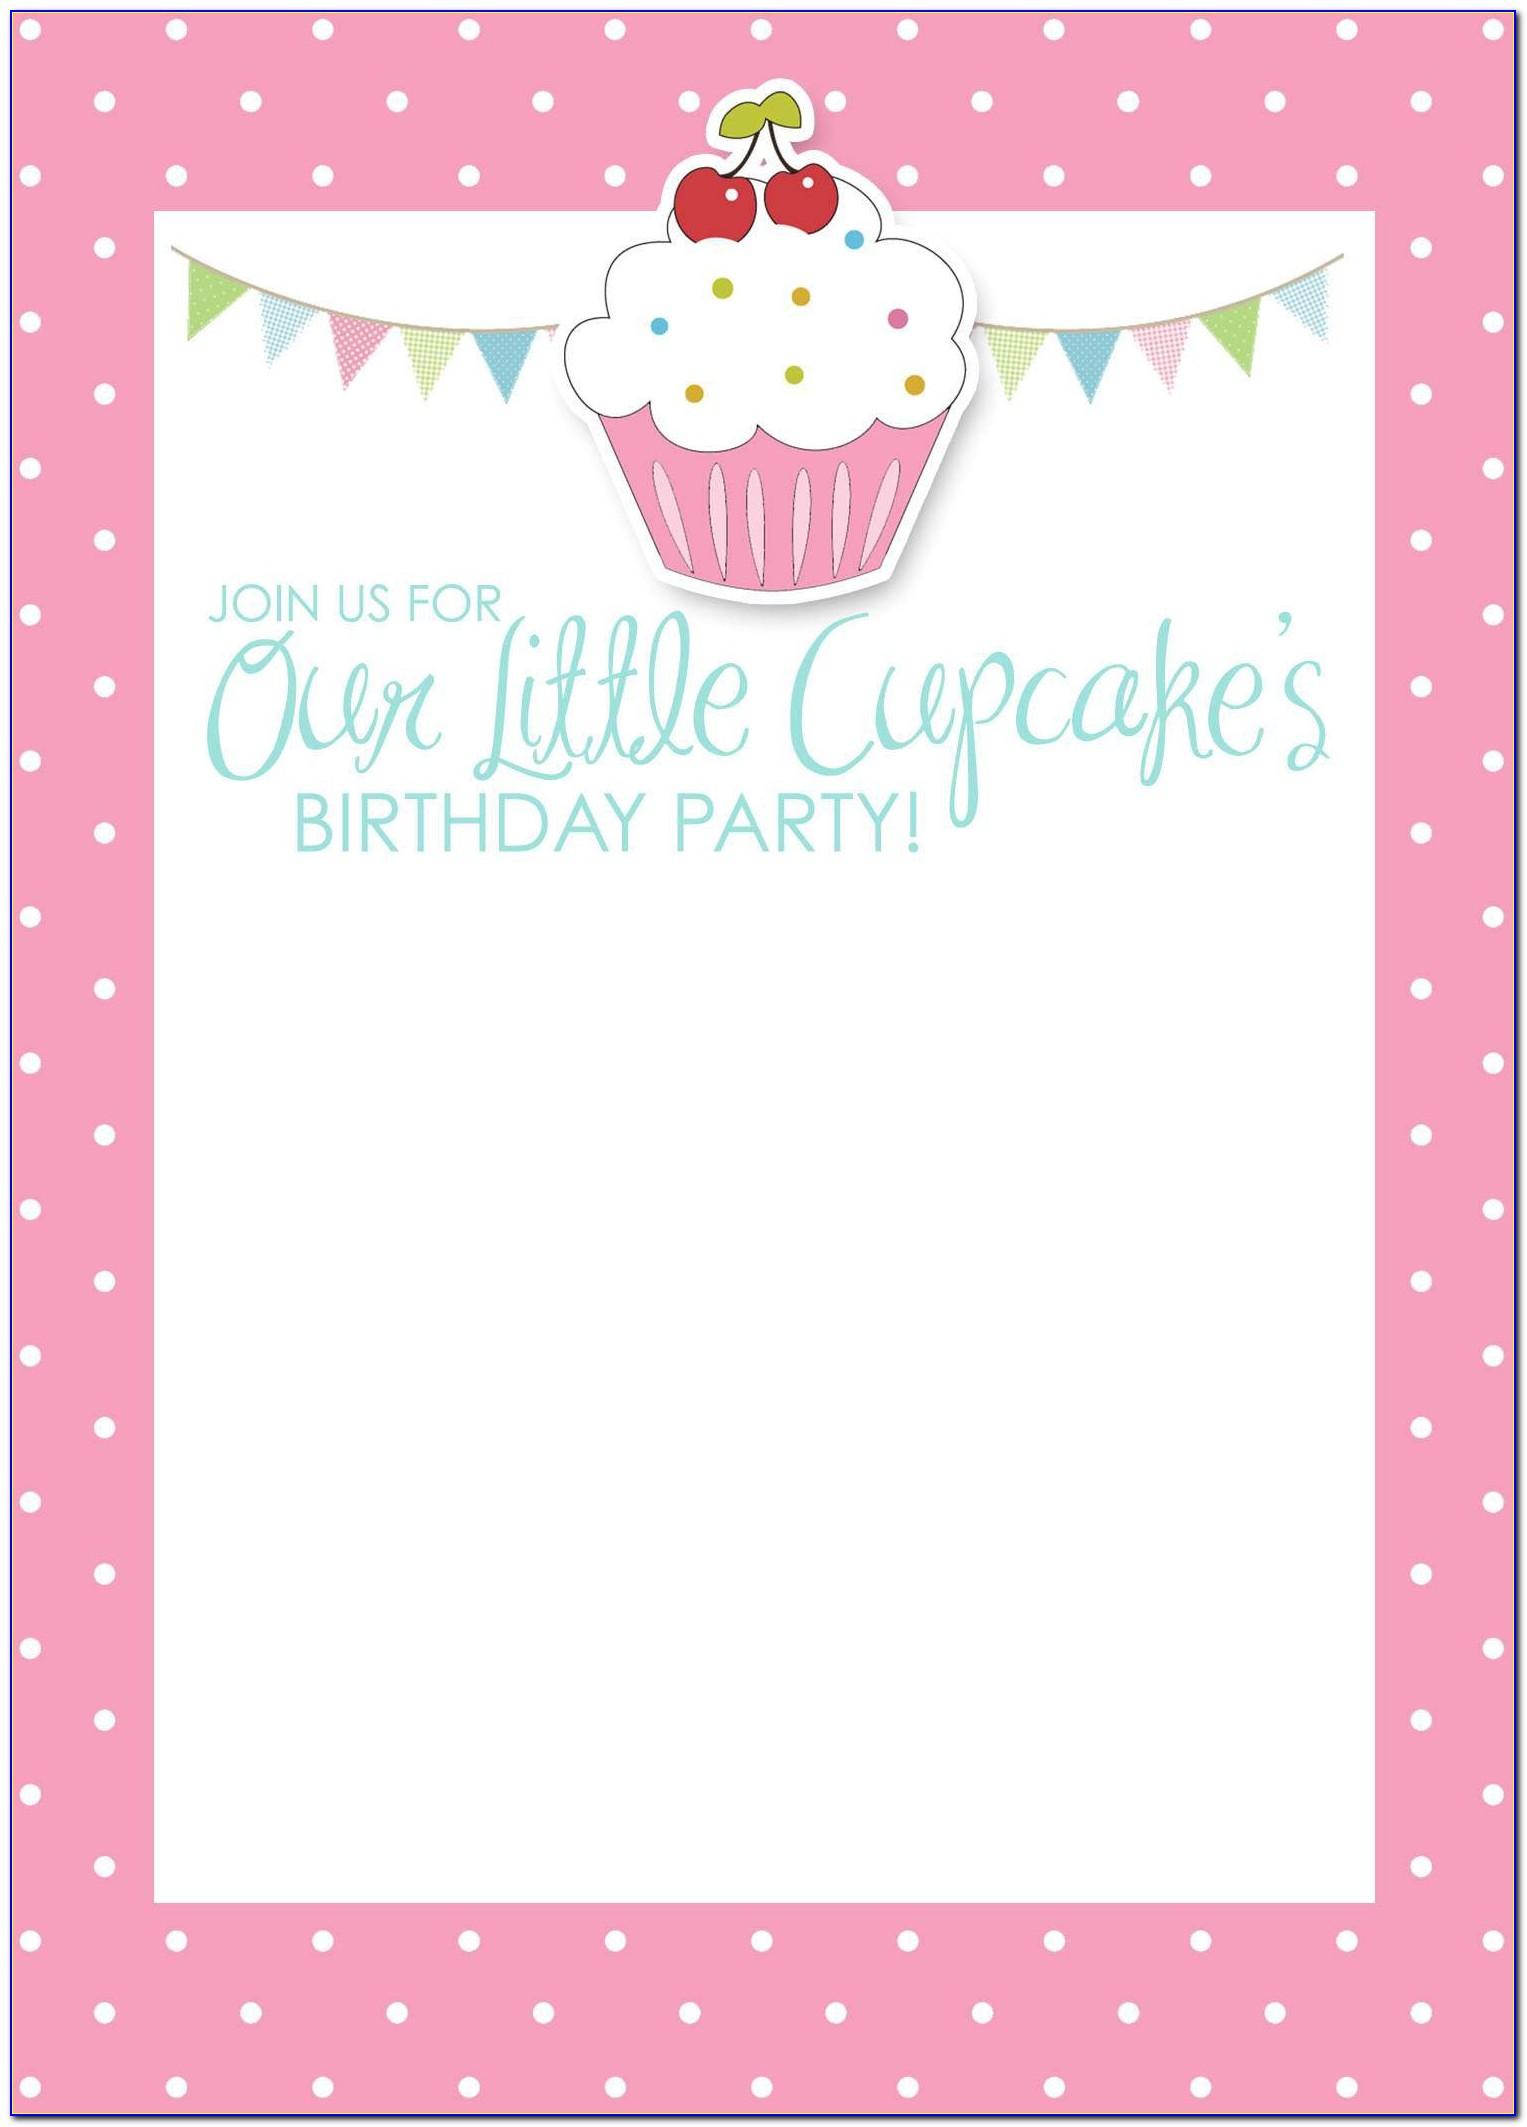 Birthday Party Invitation Cards Samples